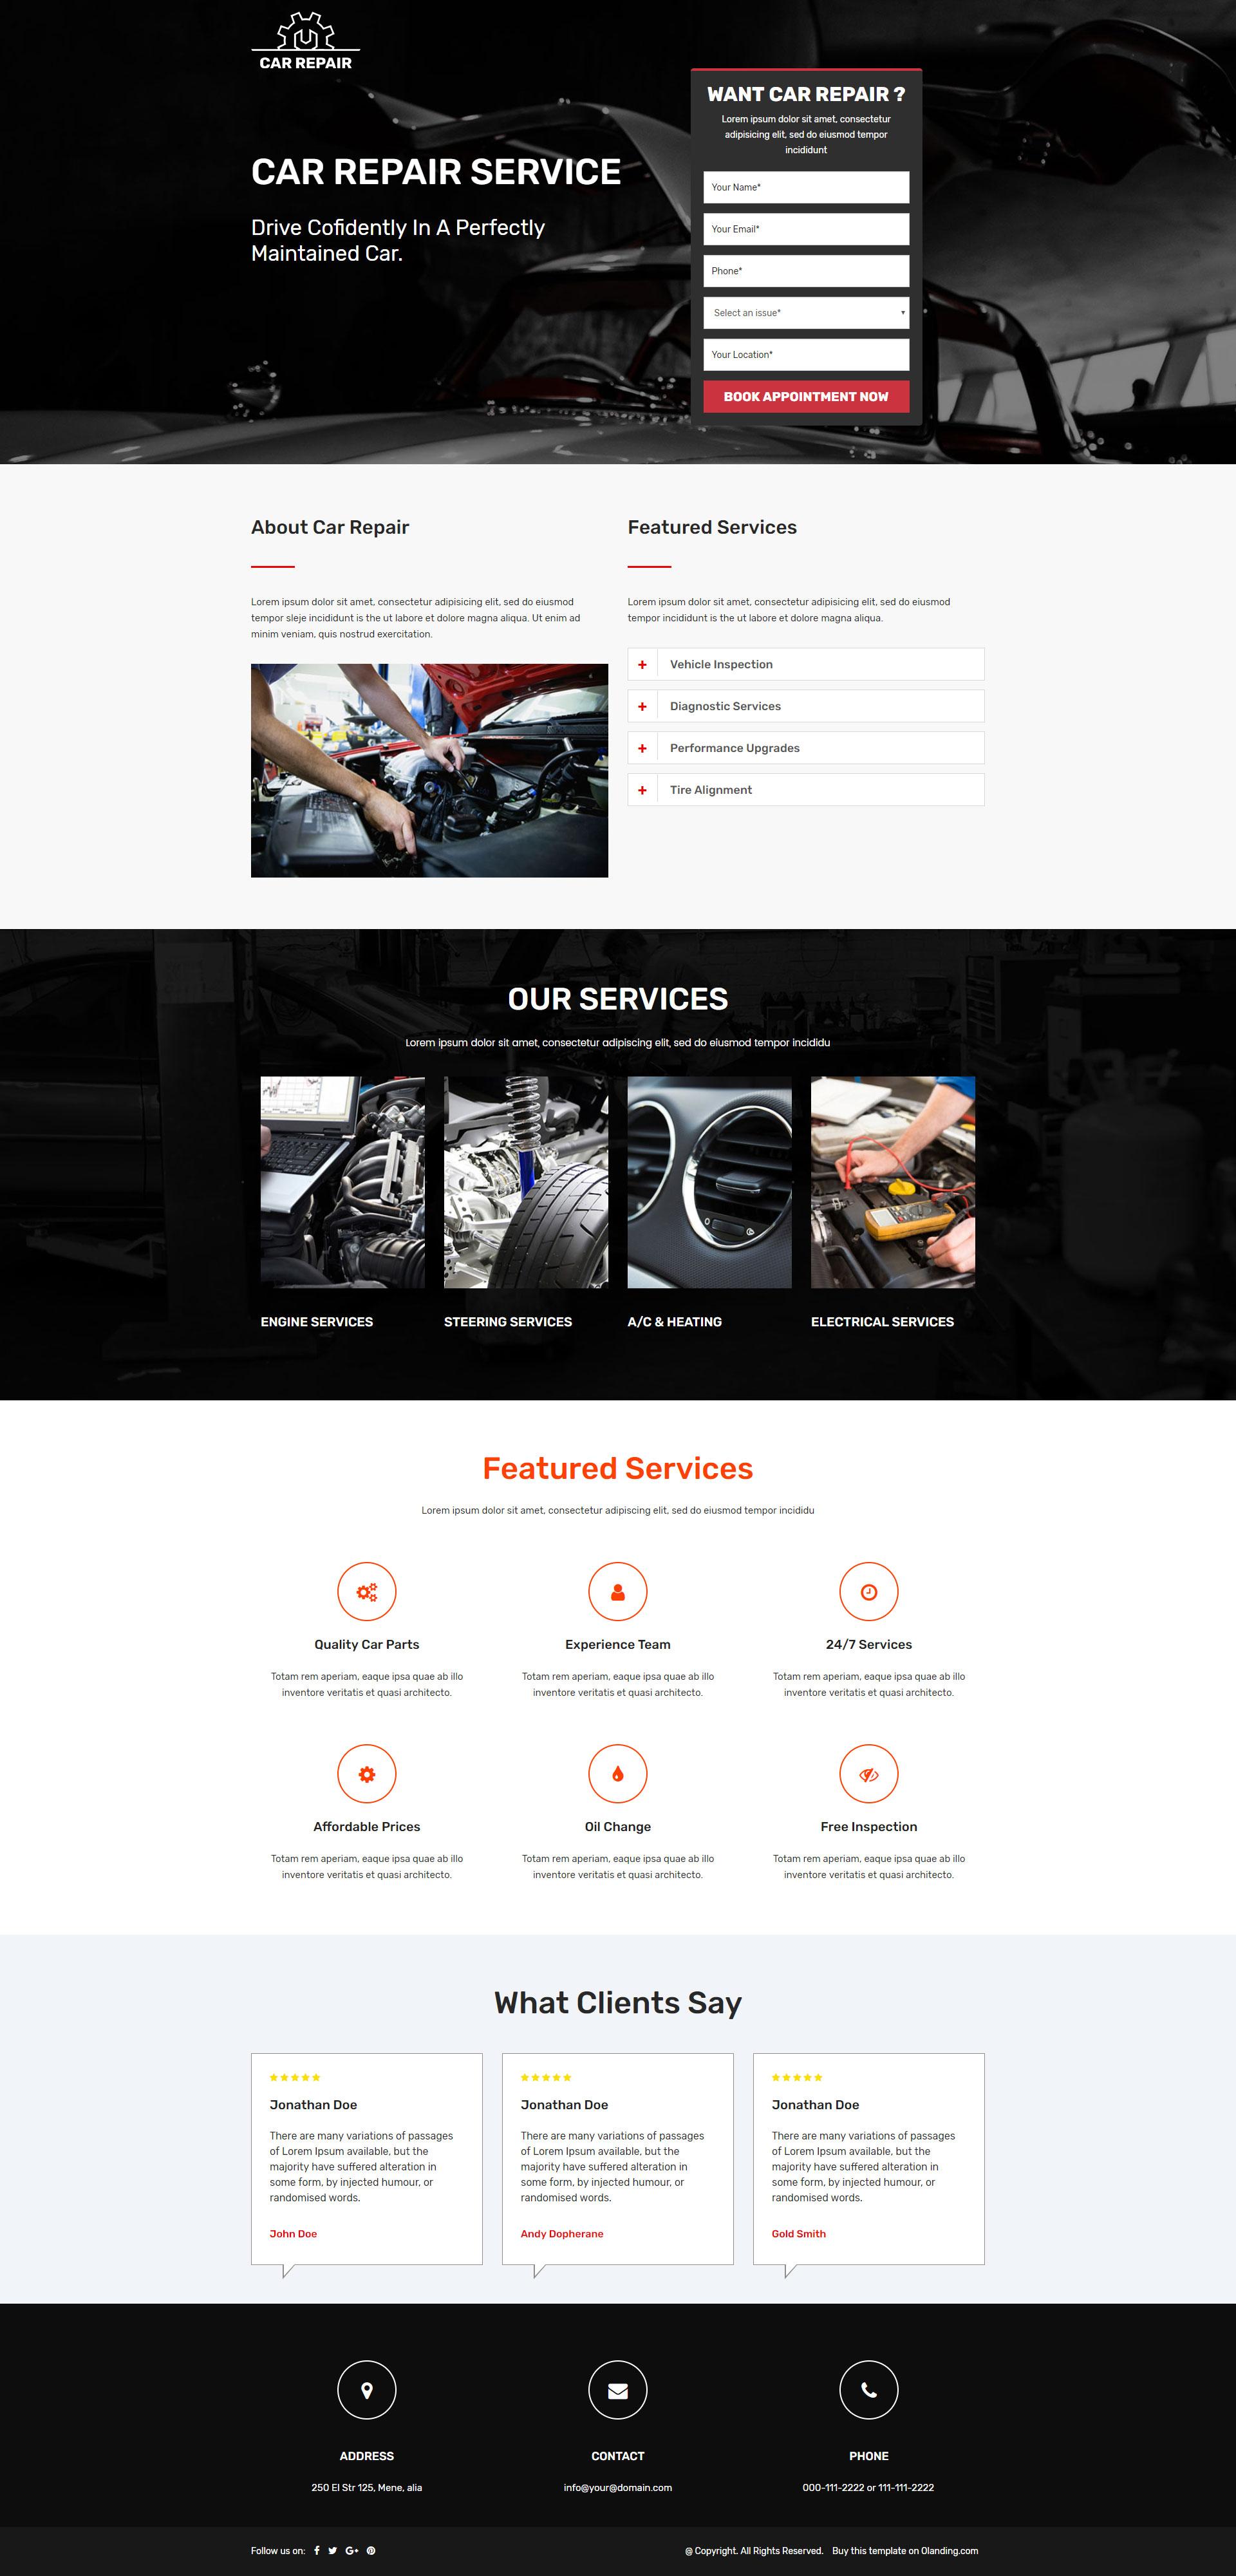 car repairing services landing page